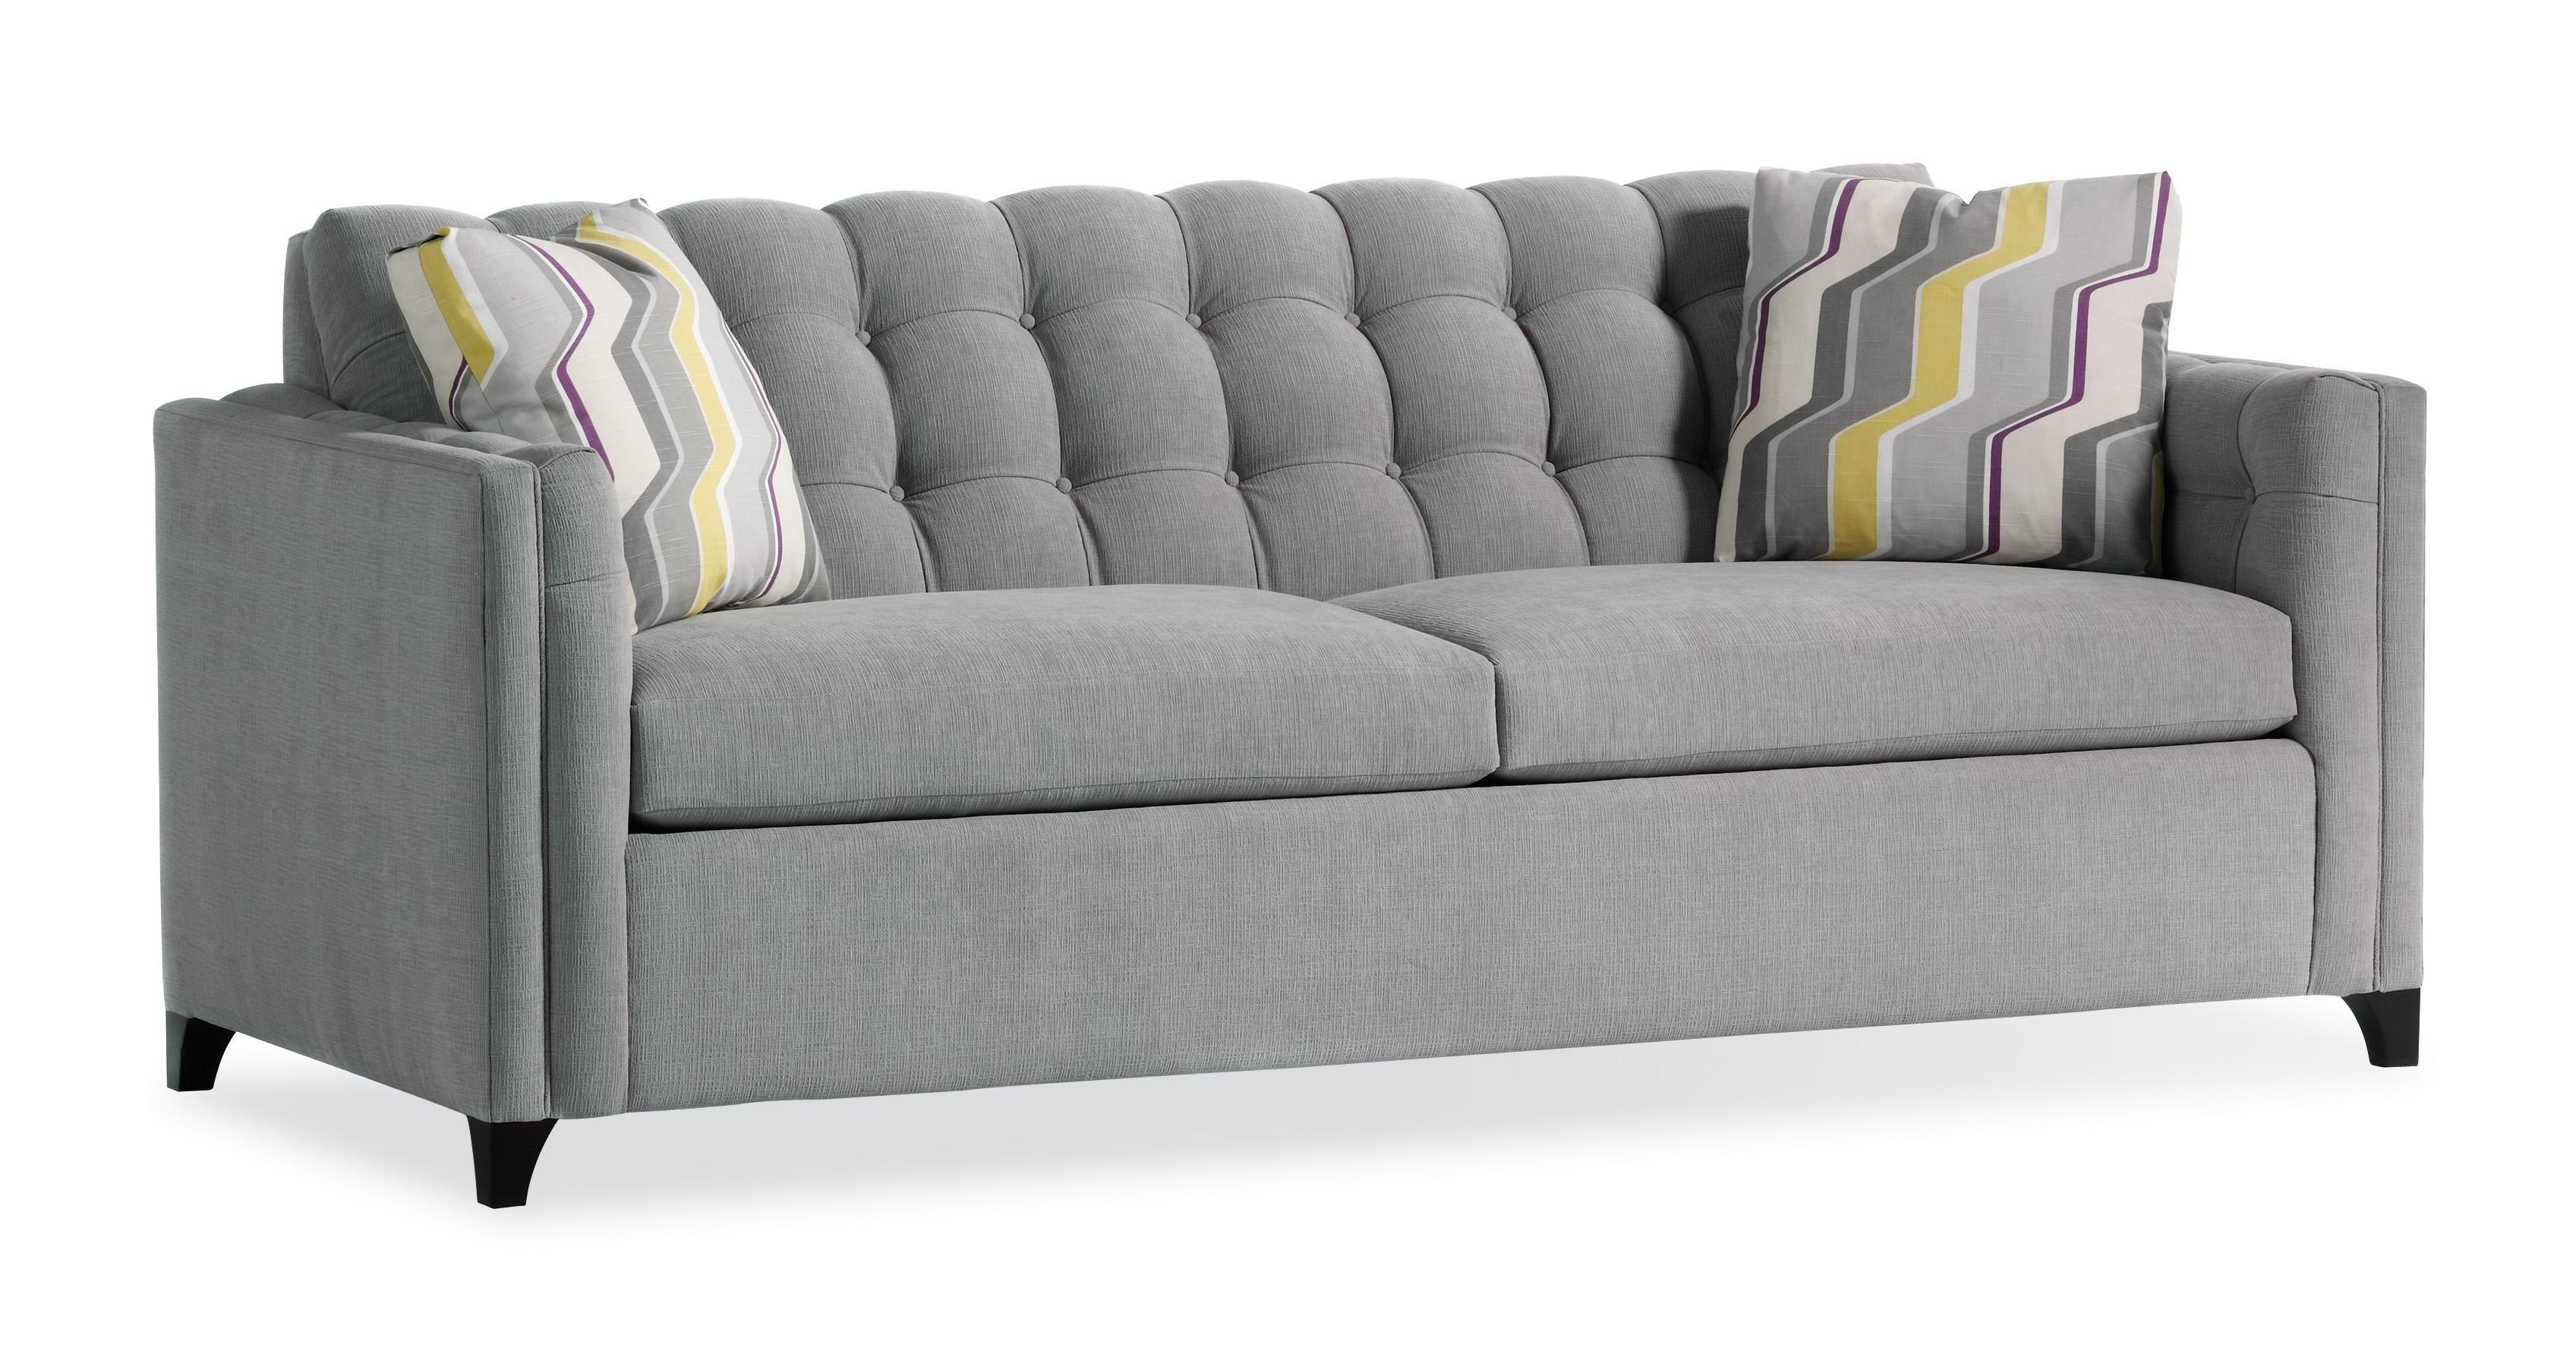 Sleeper Sofa Denver With Design Hd Images 31615 | Kengire Throughout Denver Sleeper Sofas (Image 9 of 20)